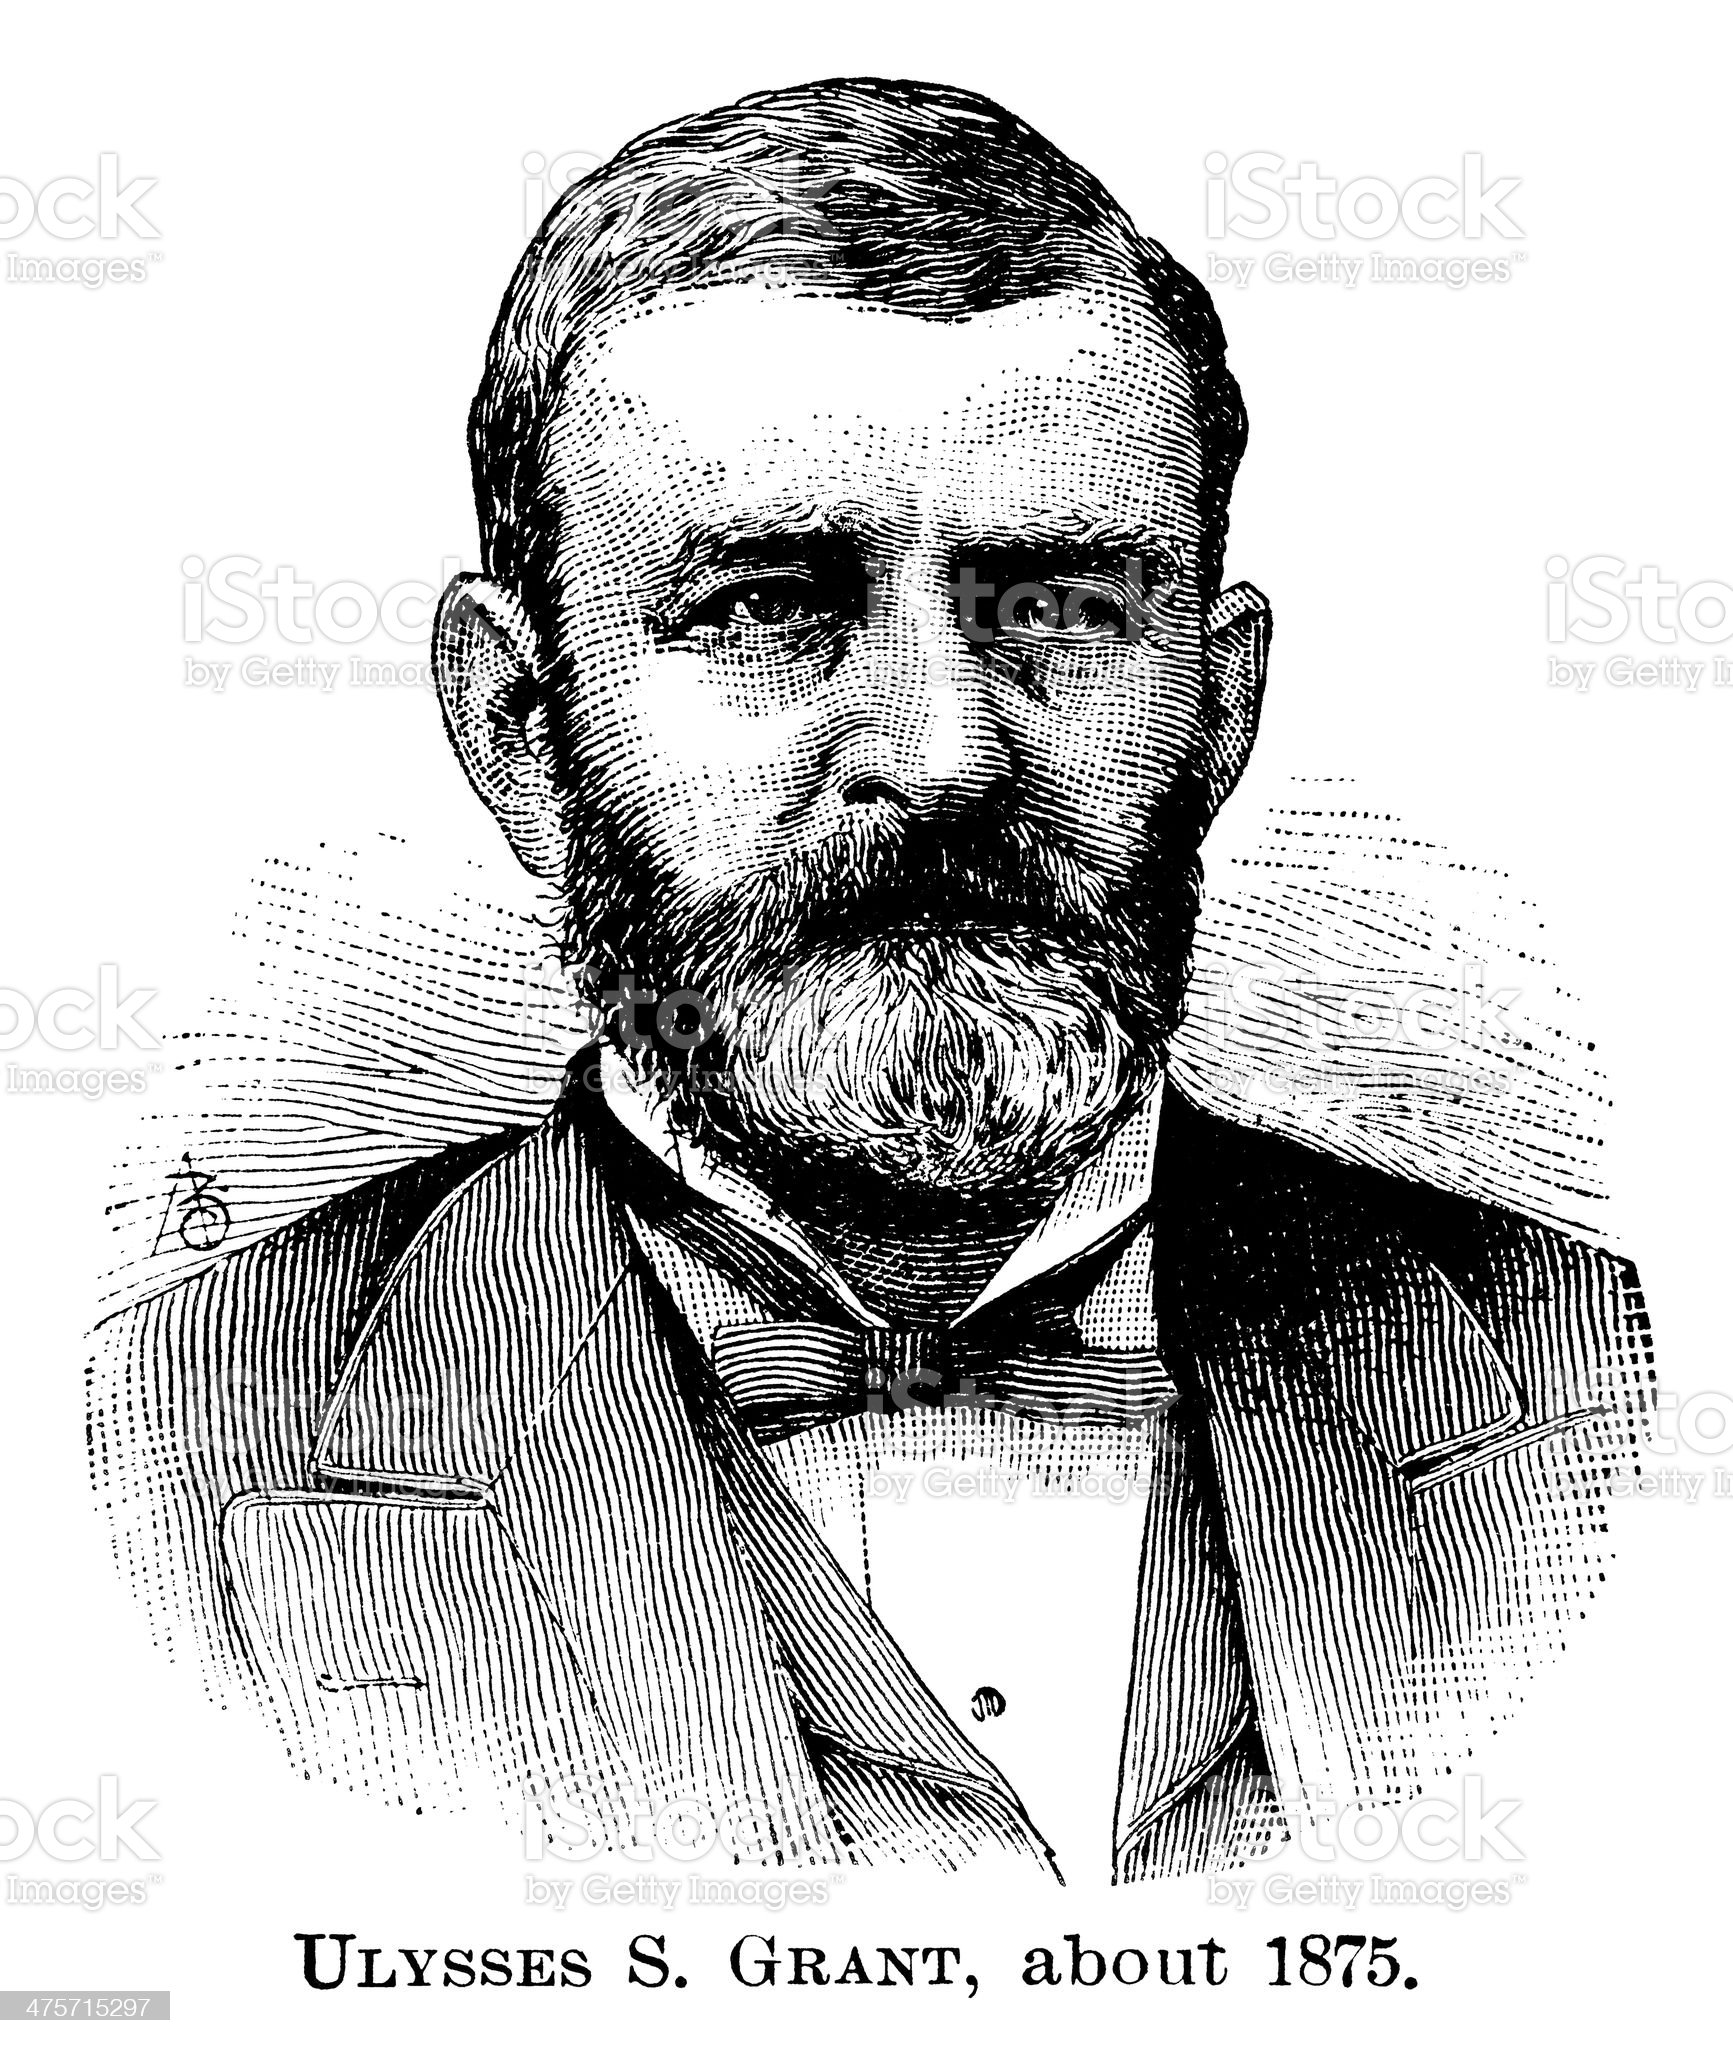 Ulysses S. Grant - Antique Engraved Portrait royalty-free stock vector art